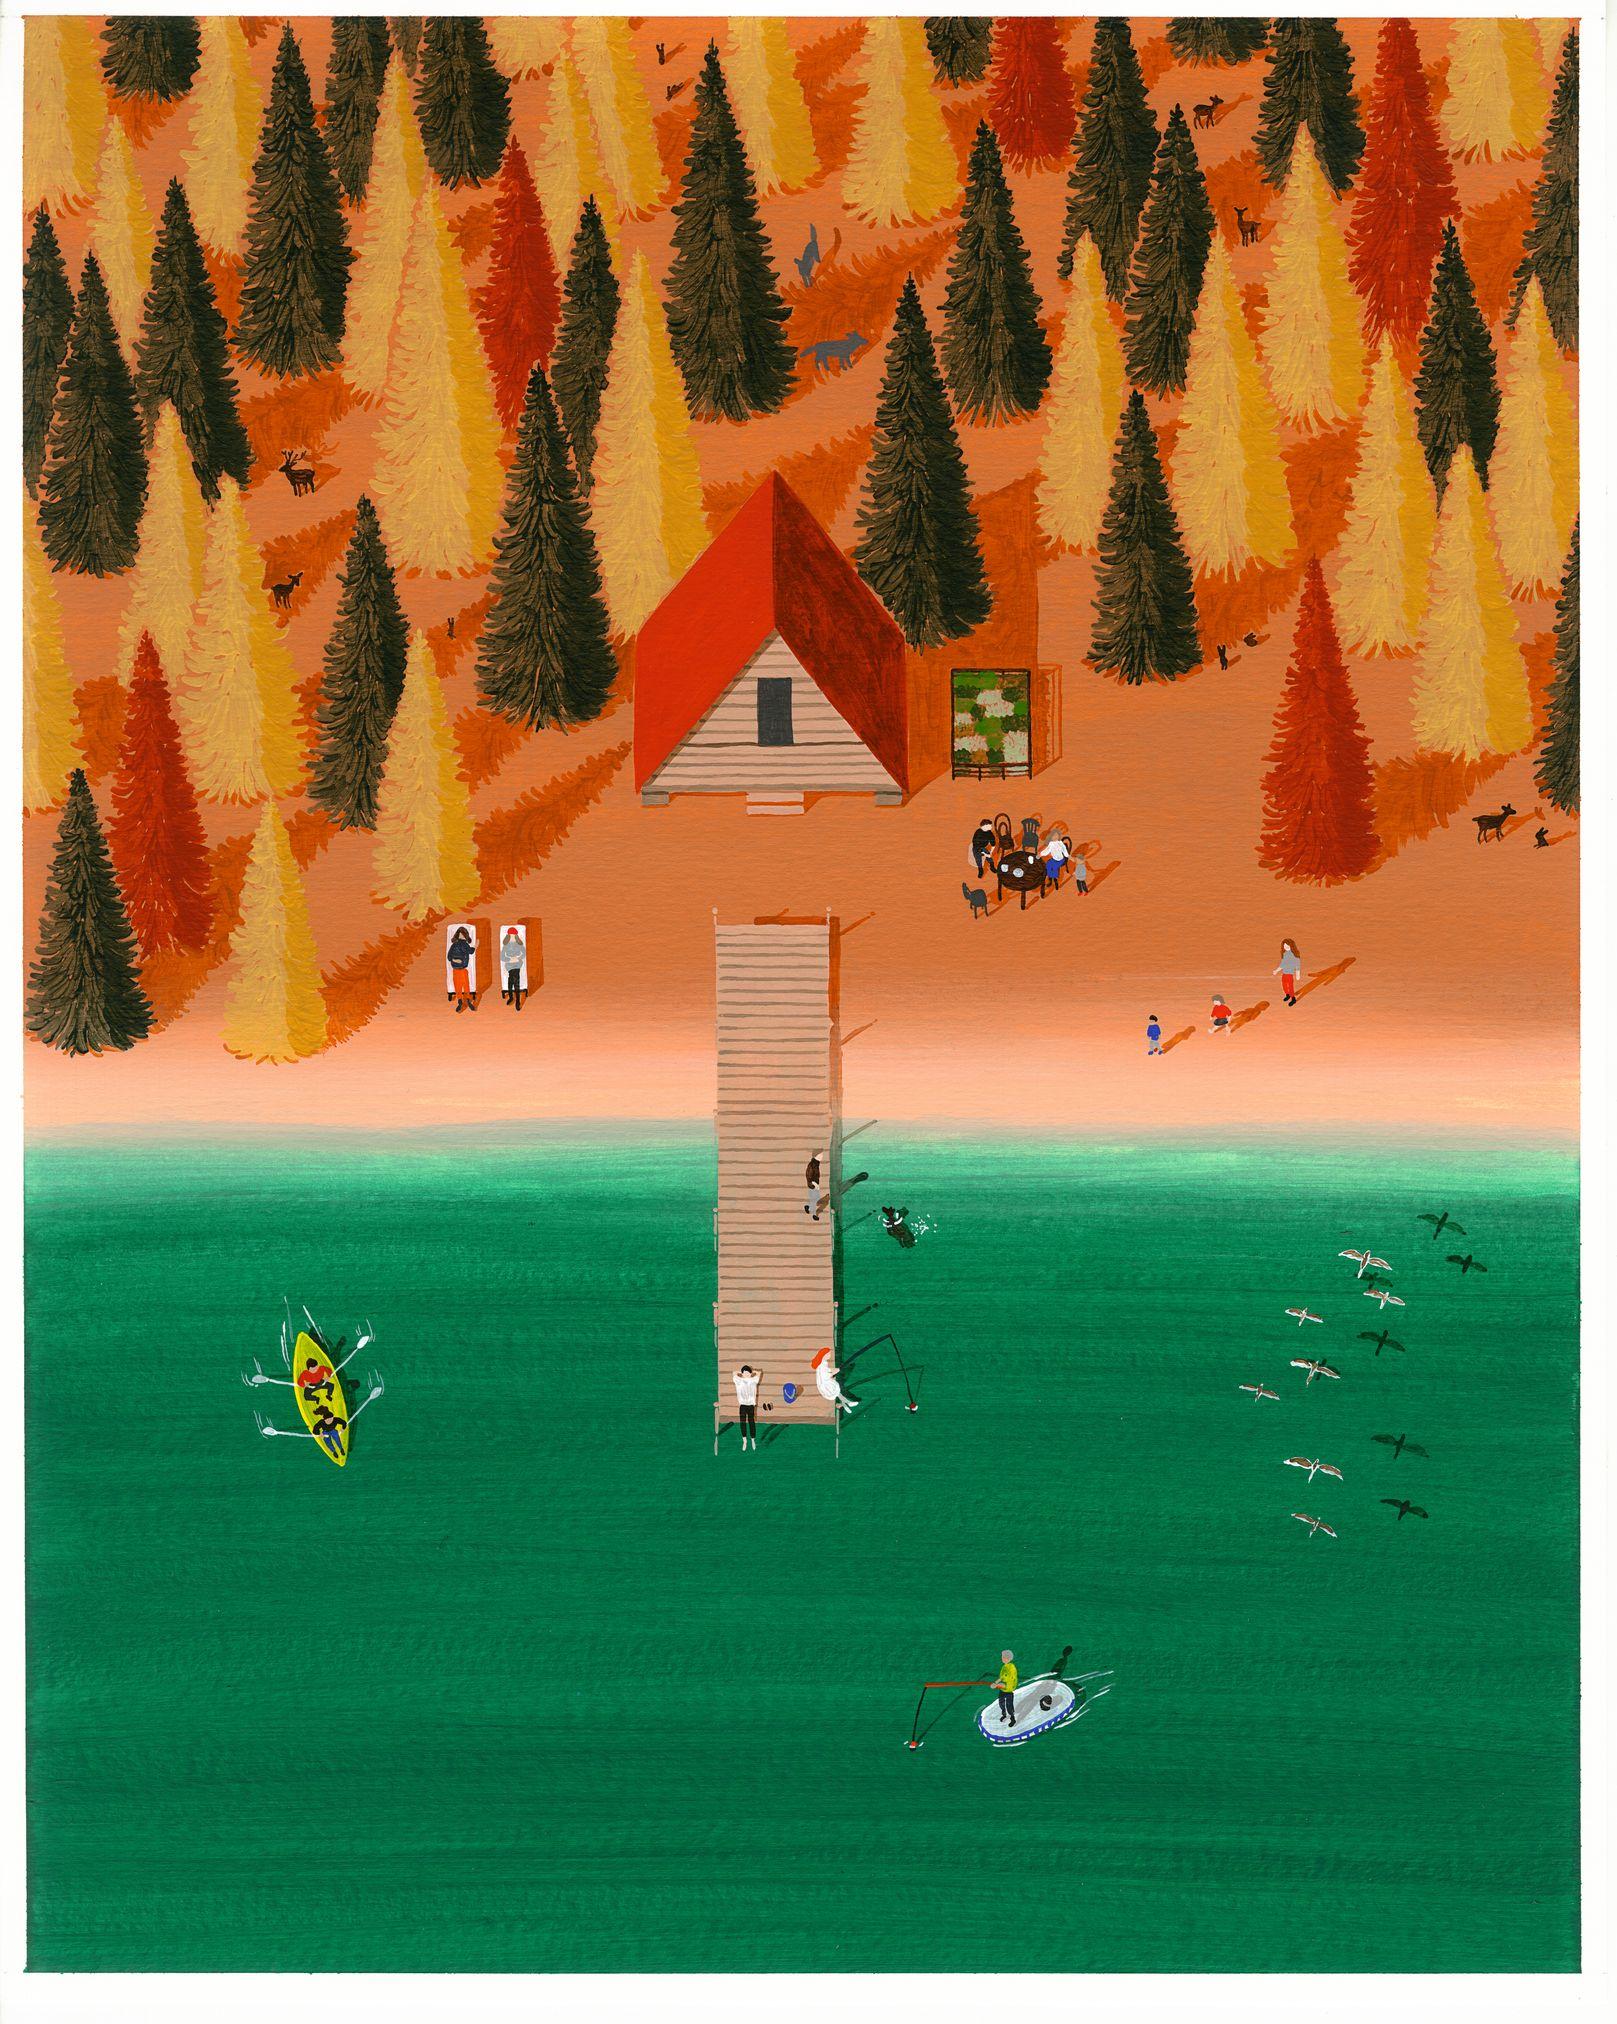 garance-illustration-yukiko-noritake-The-Brothers-Forest5